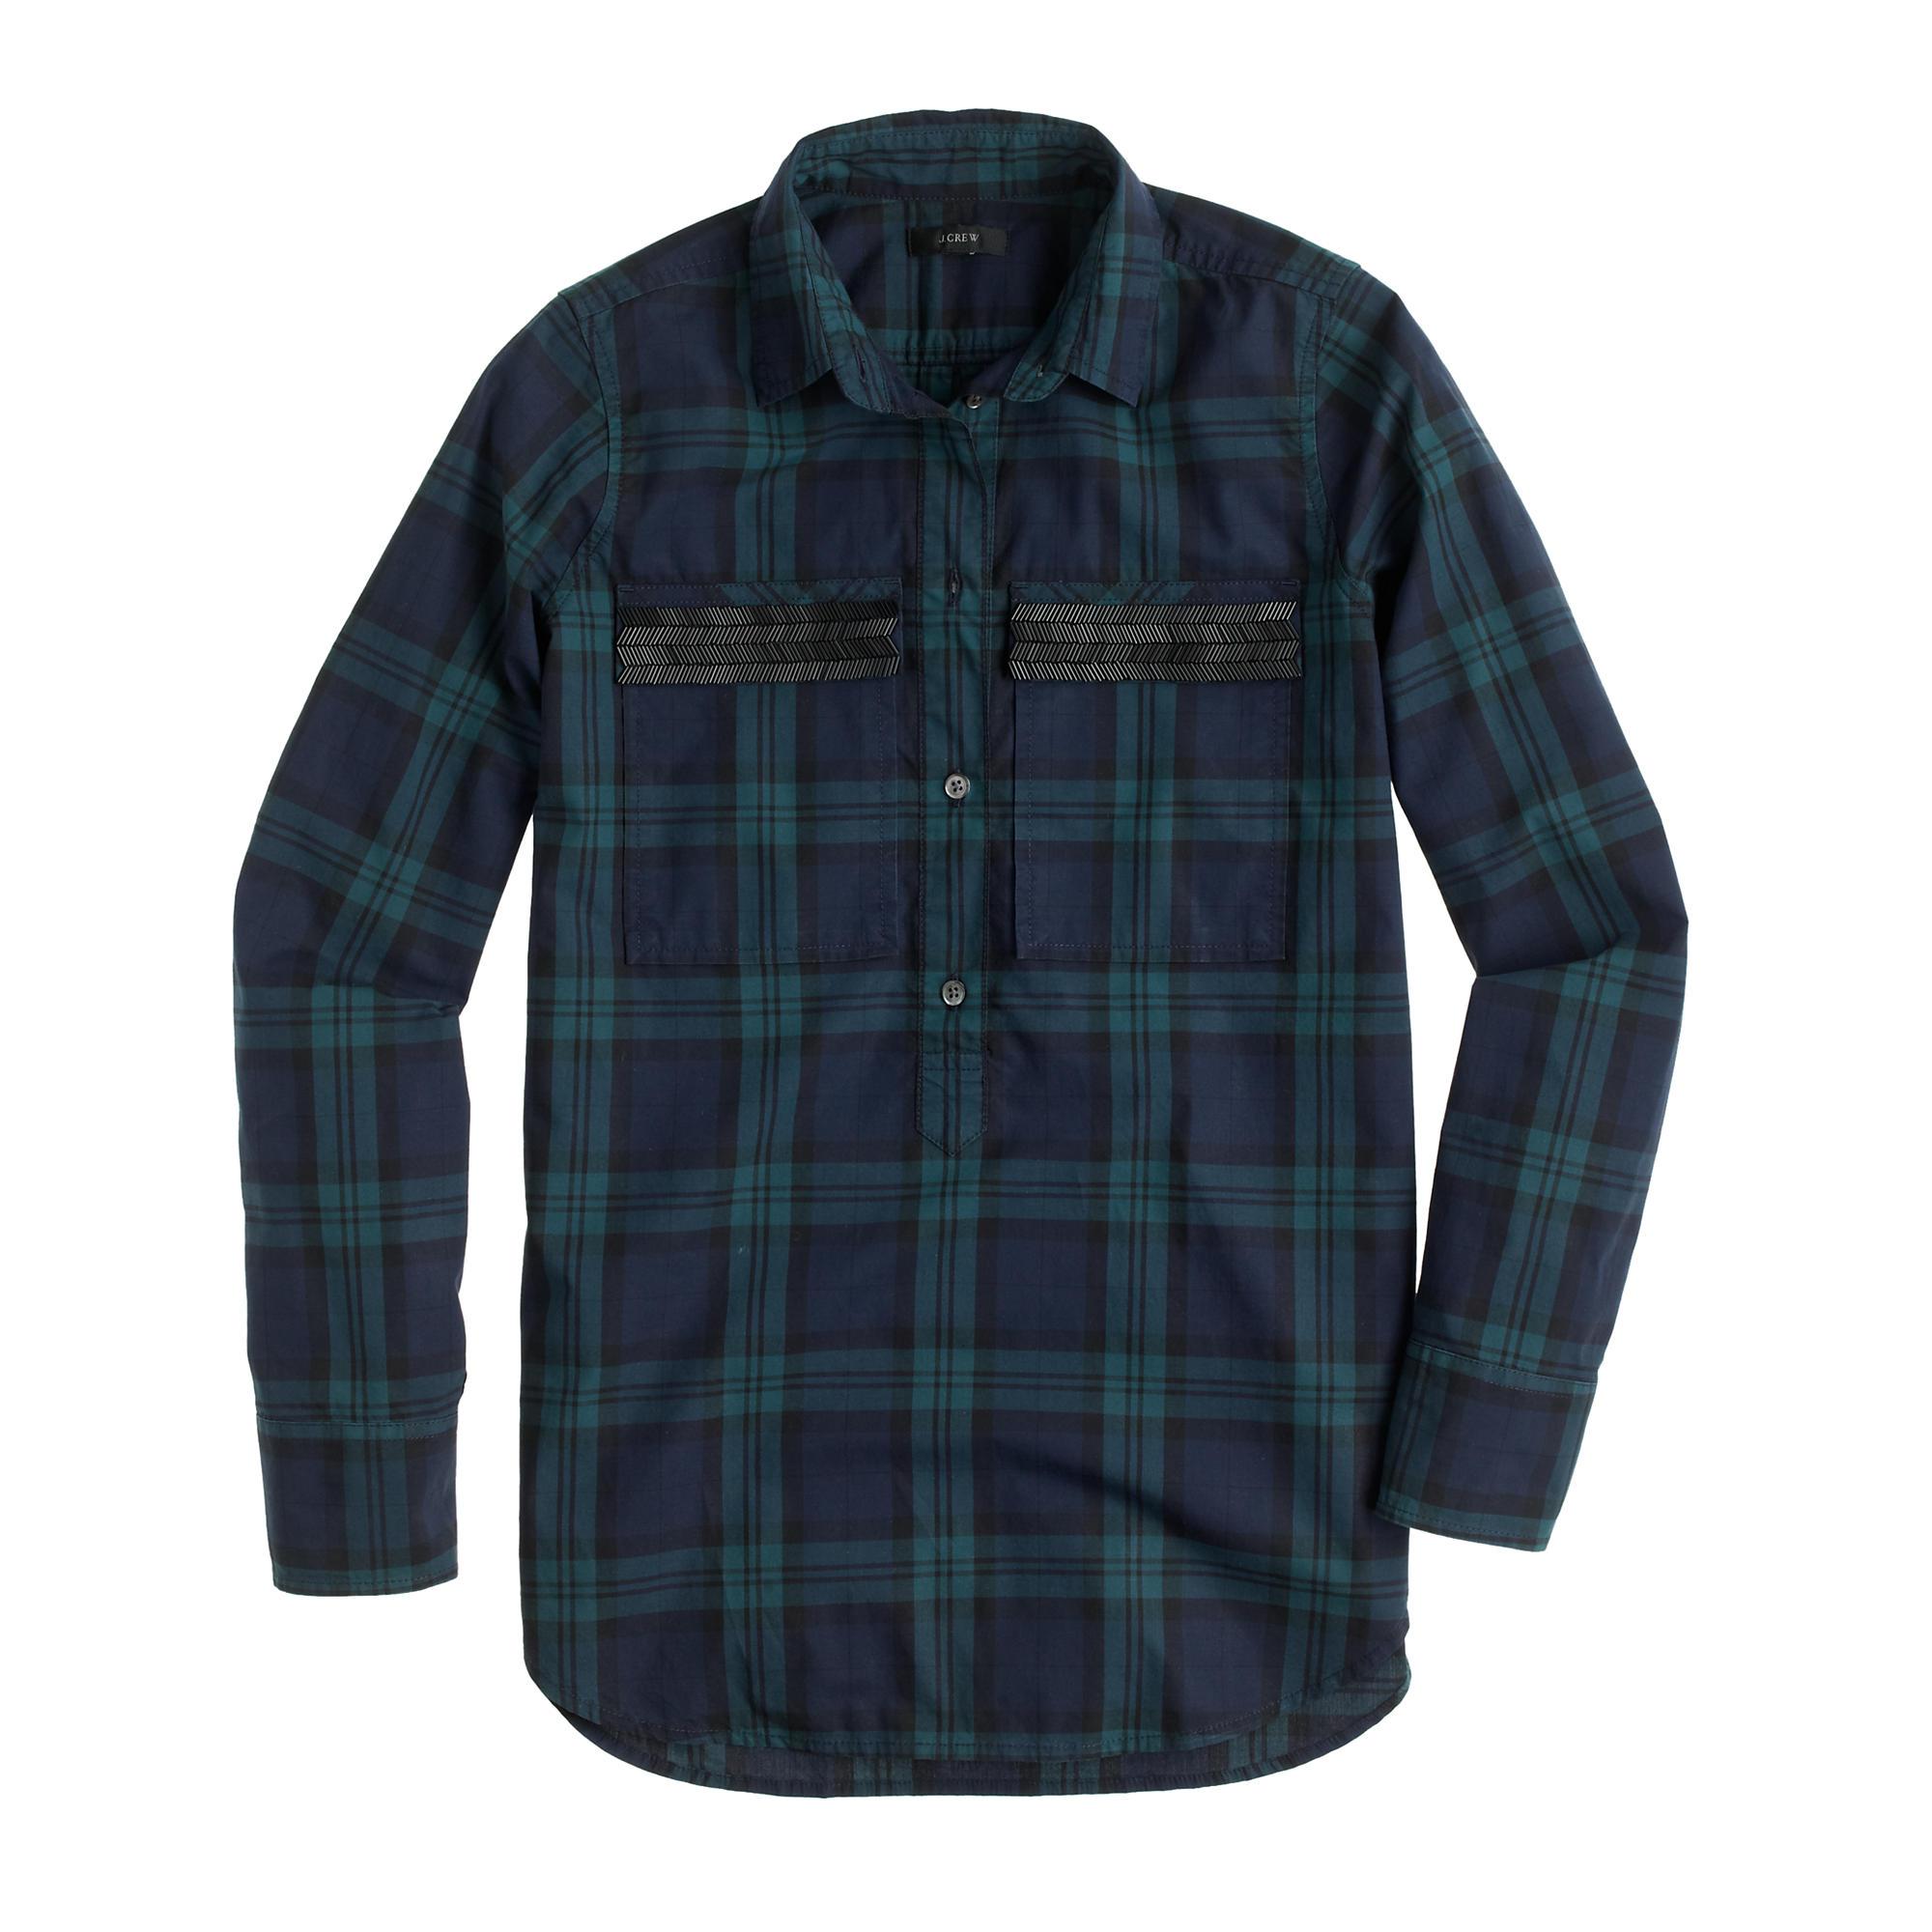 Beaded chevron popover shirt in black watch plaid j crew for Black watch plaid flannel shirt